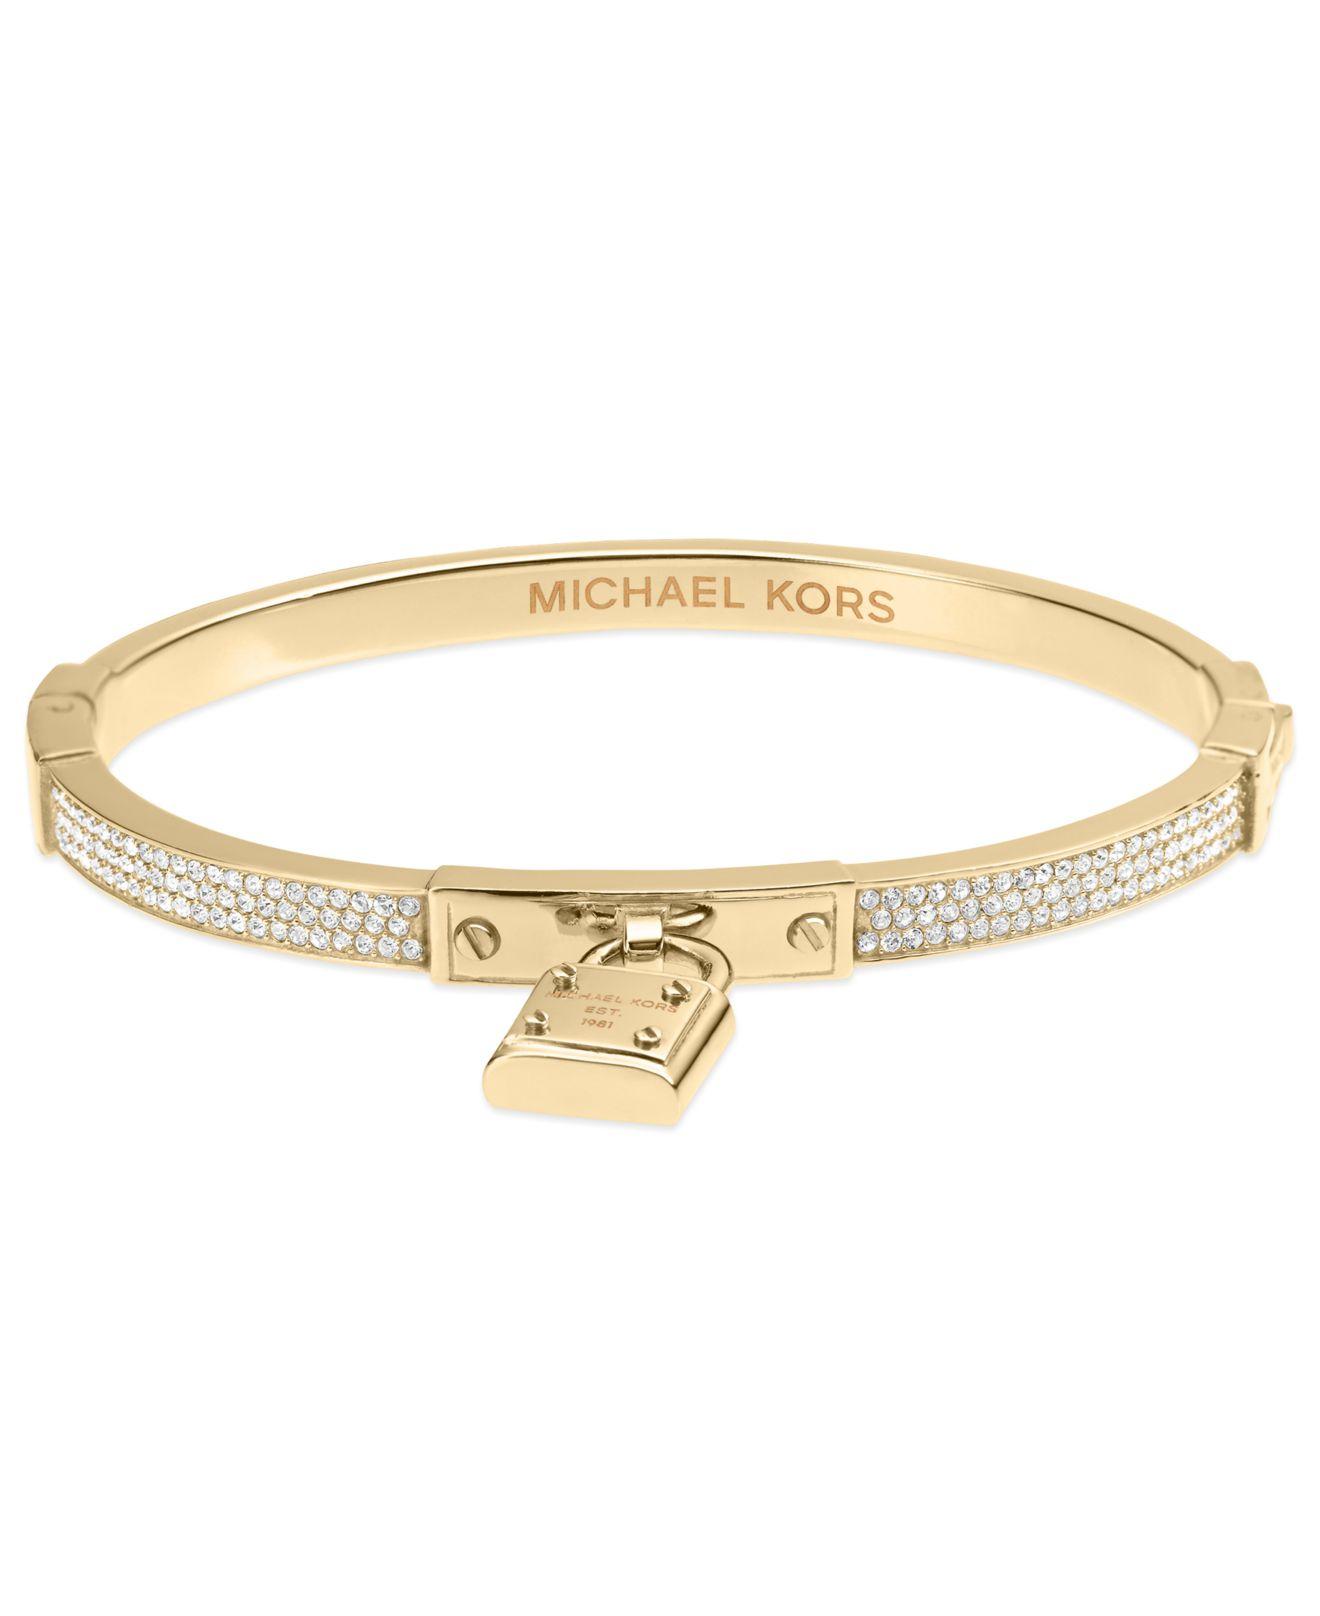 Lyst - Michael Kors Gold-Tone Padlock Charm Bracelet in ...